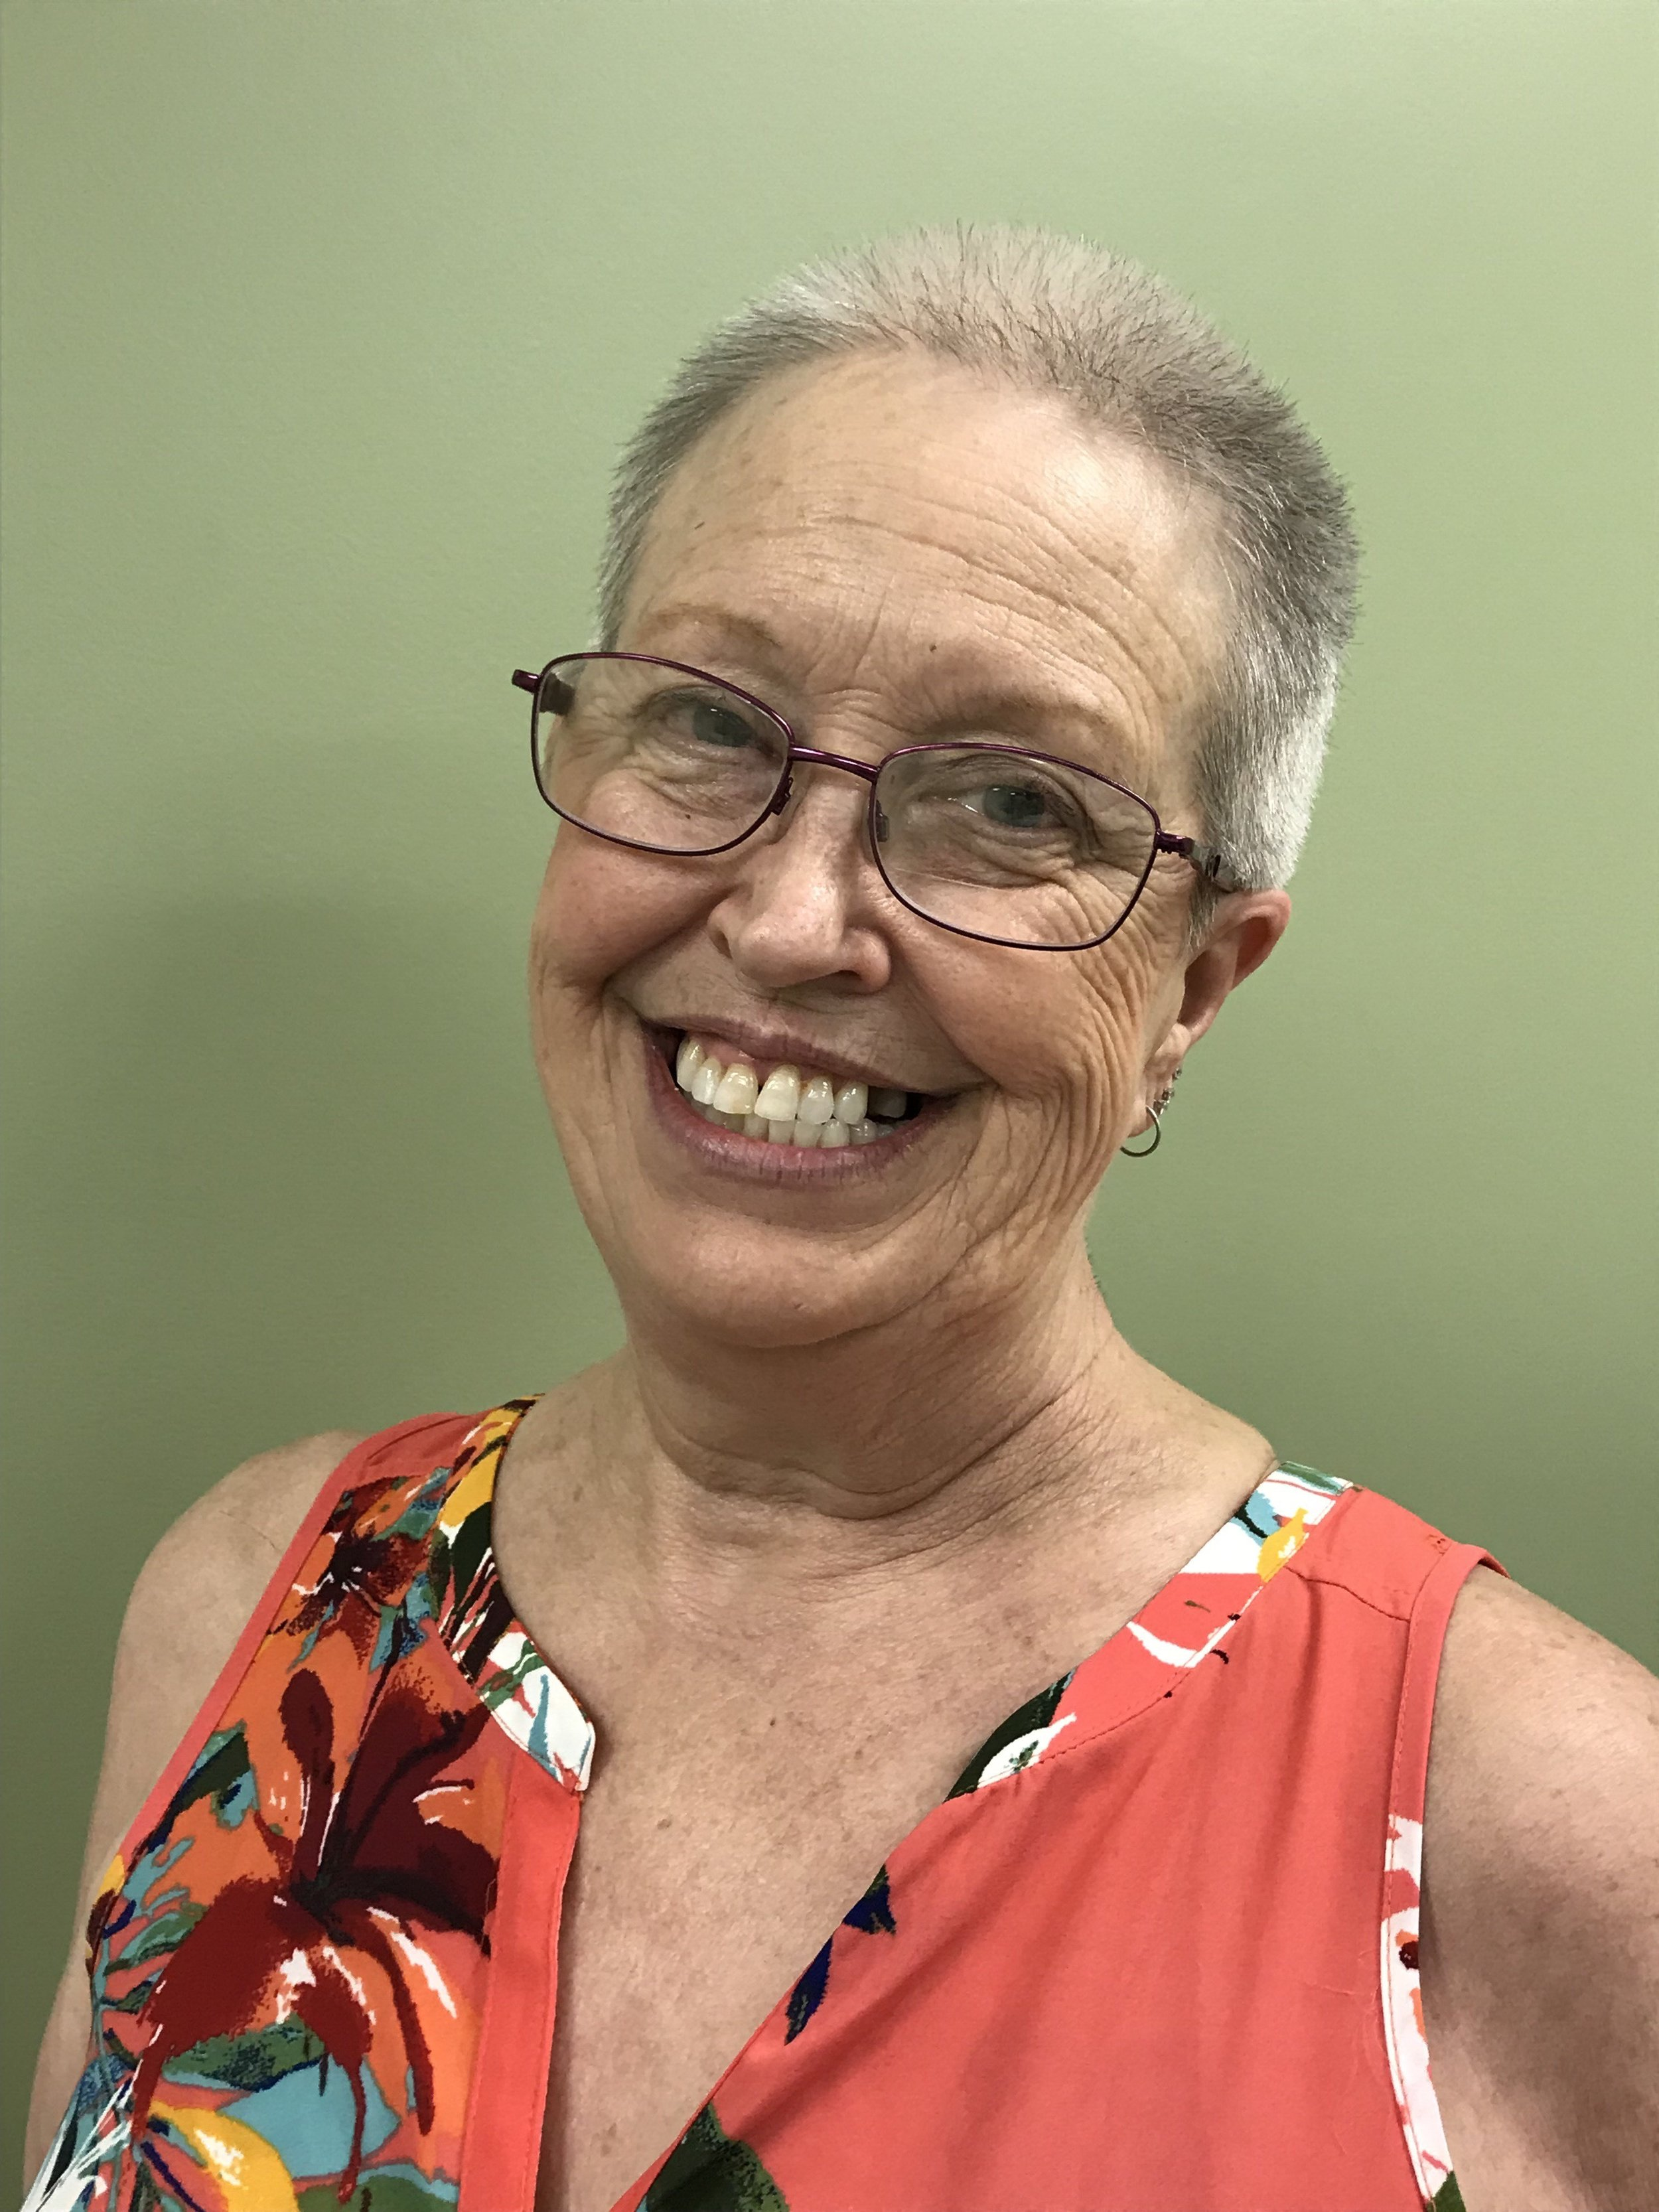 Janice Hobbs, Board of Directors, Survivors Lead ACTION